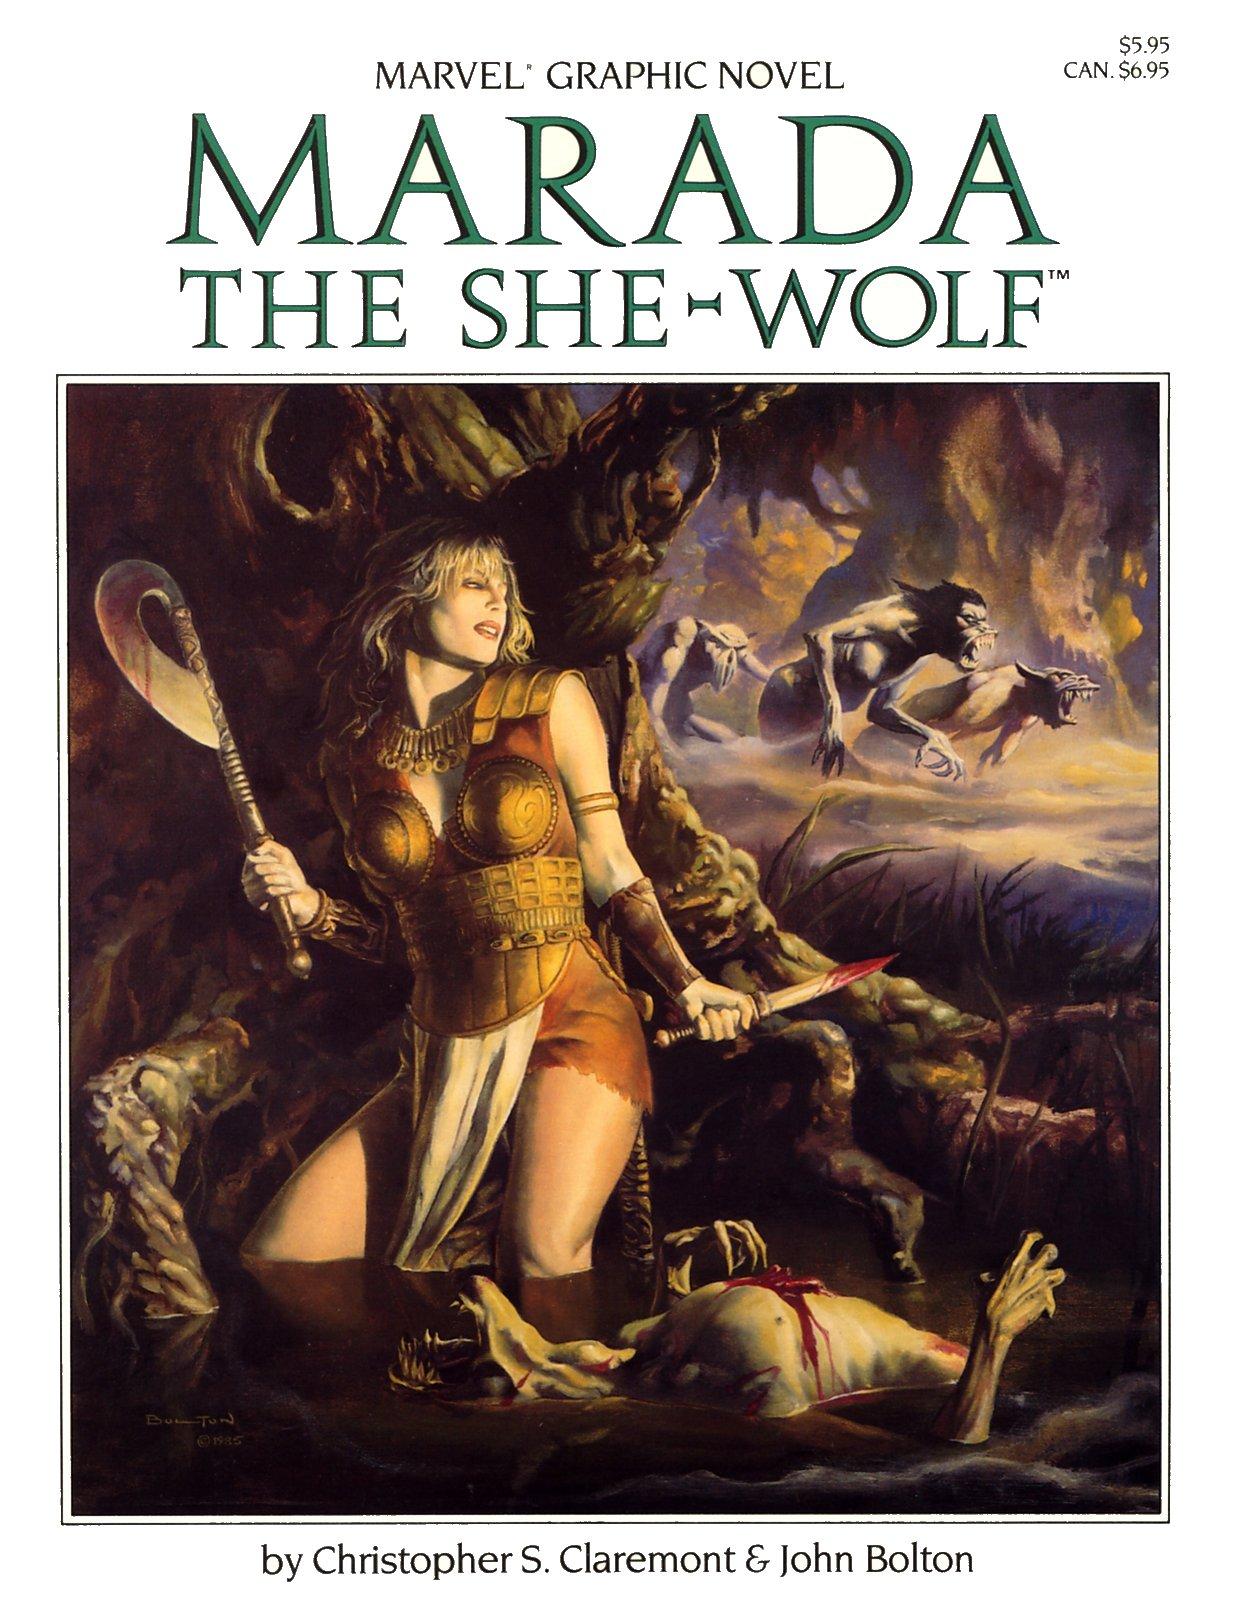 Marvel Graphic Novel 21_-_Marada_the_She-Wolf Page 1